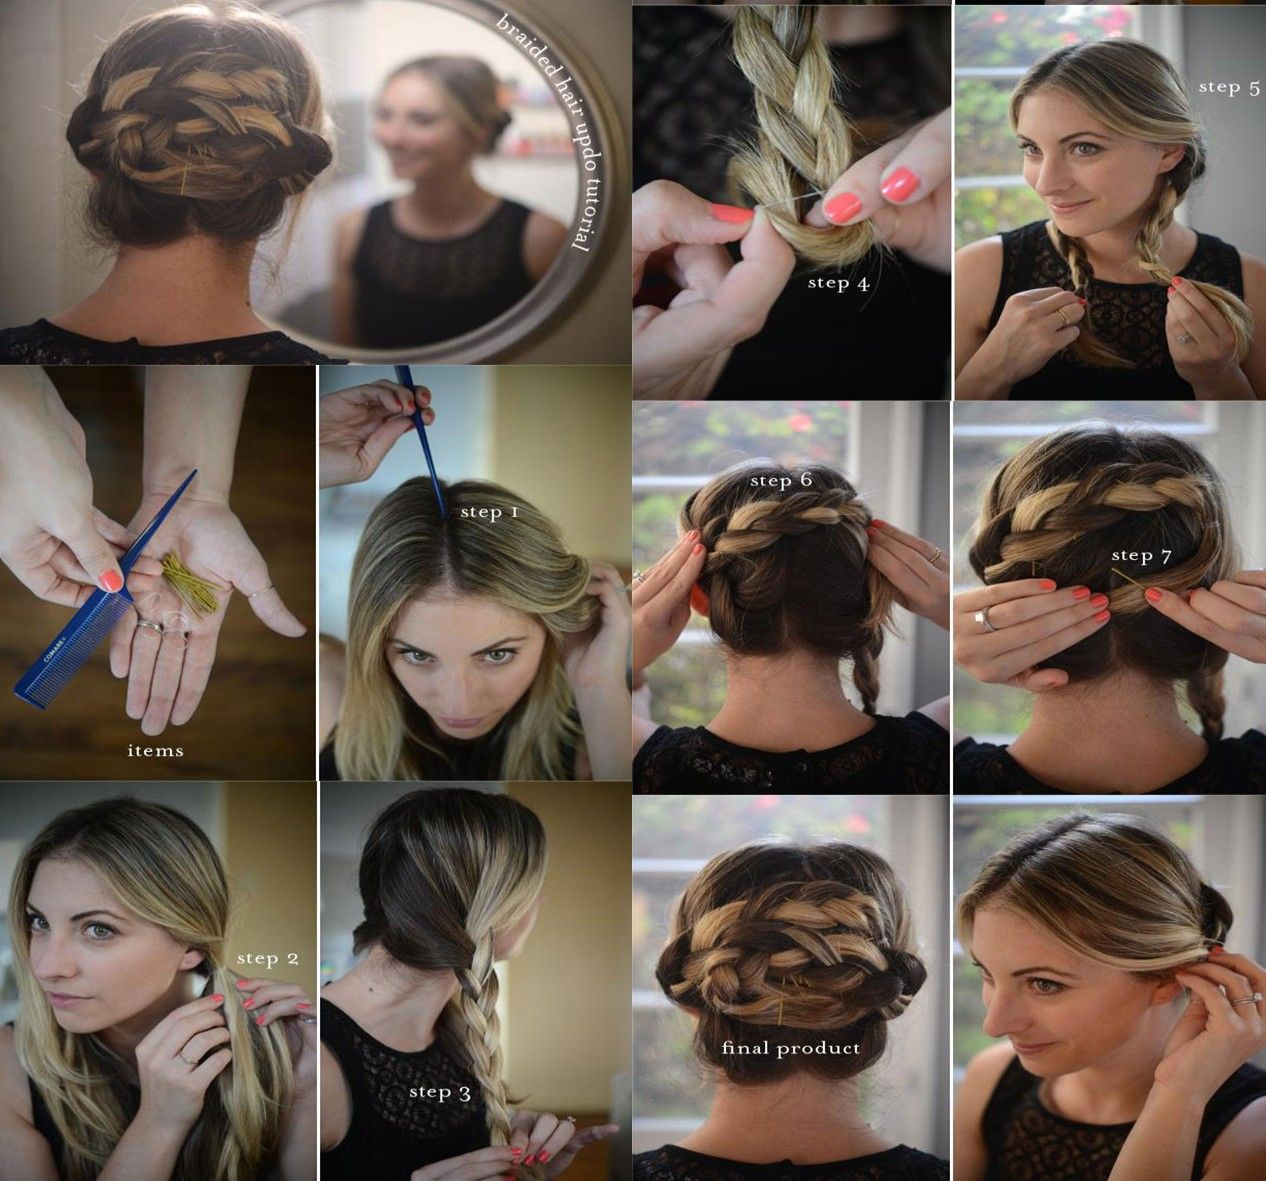 Cute Easy Hair Tutorials And Diy Hairstyles Hairstyle Ideas Diy Braid Tips For Your Hair This Spring Braid Hairstyles Step By Hair Tutorial Hair Hair Styles